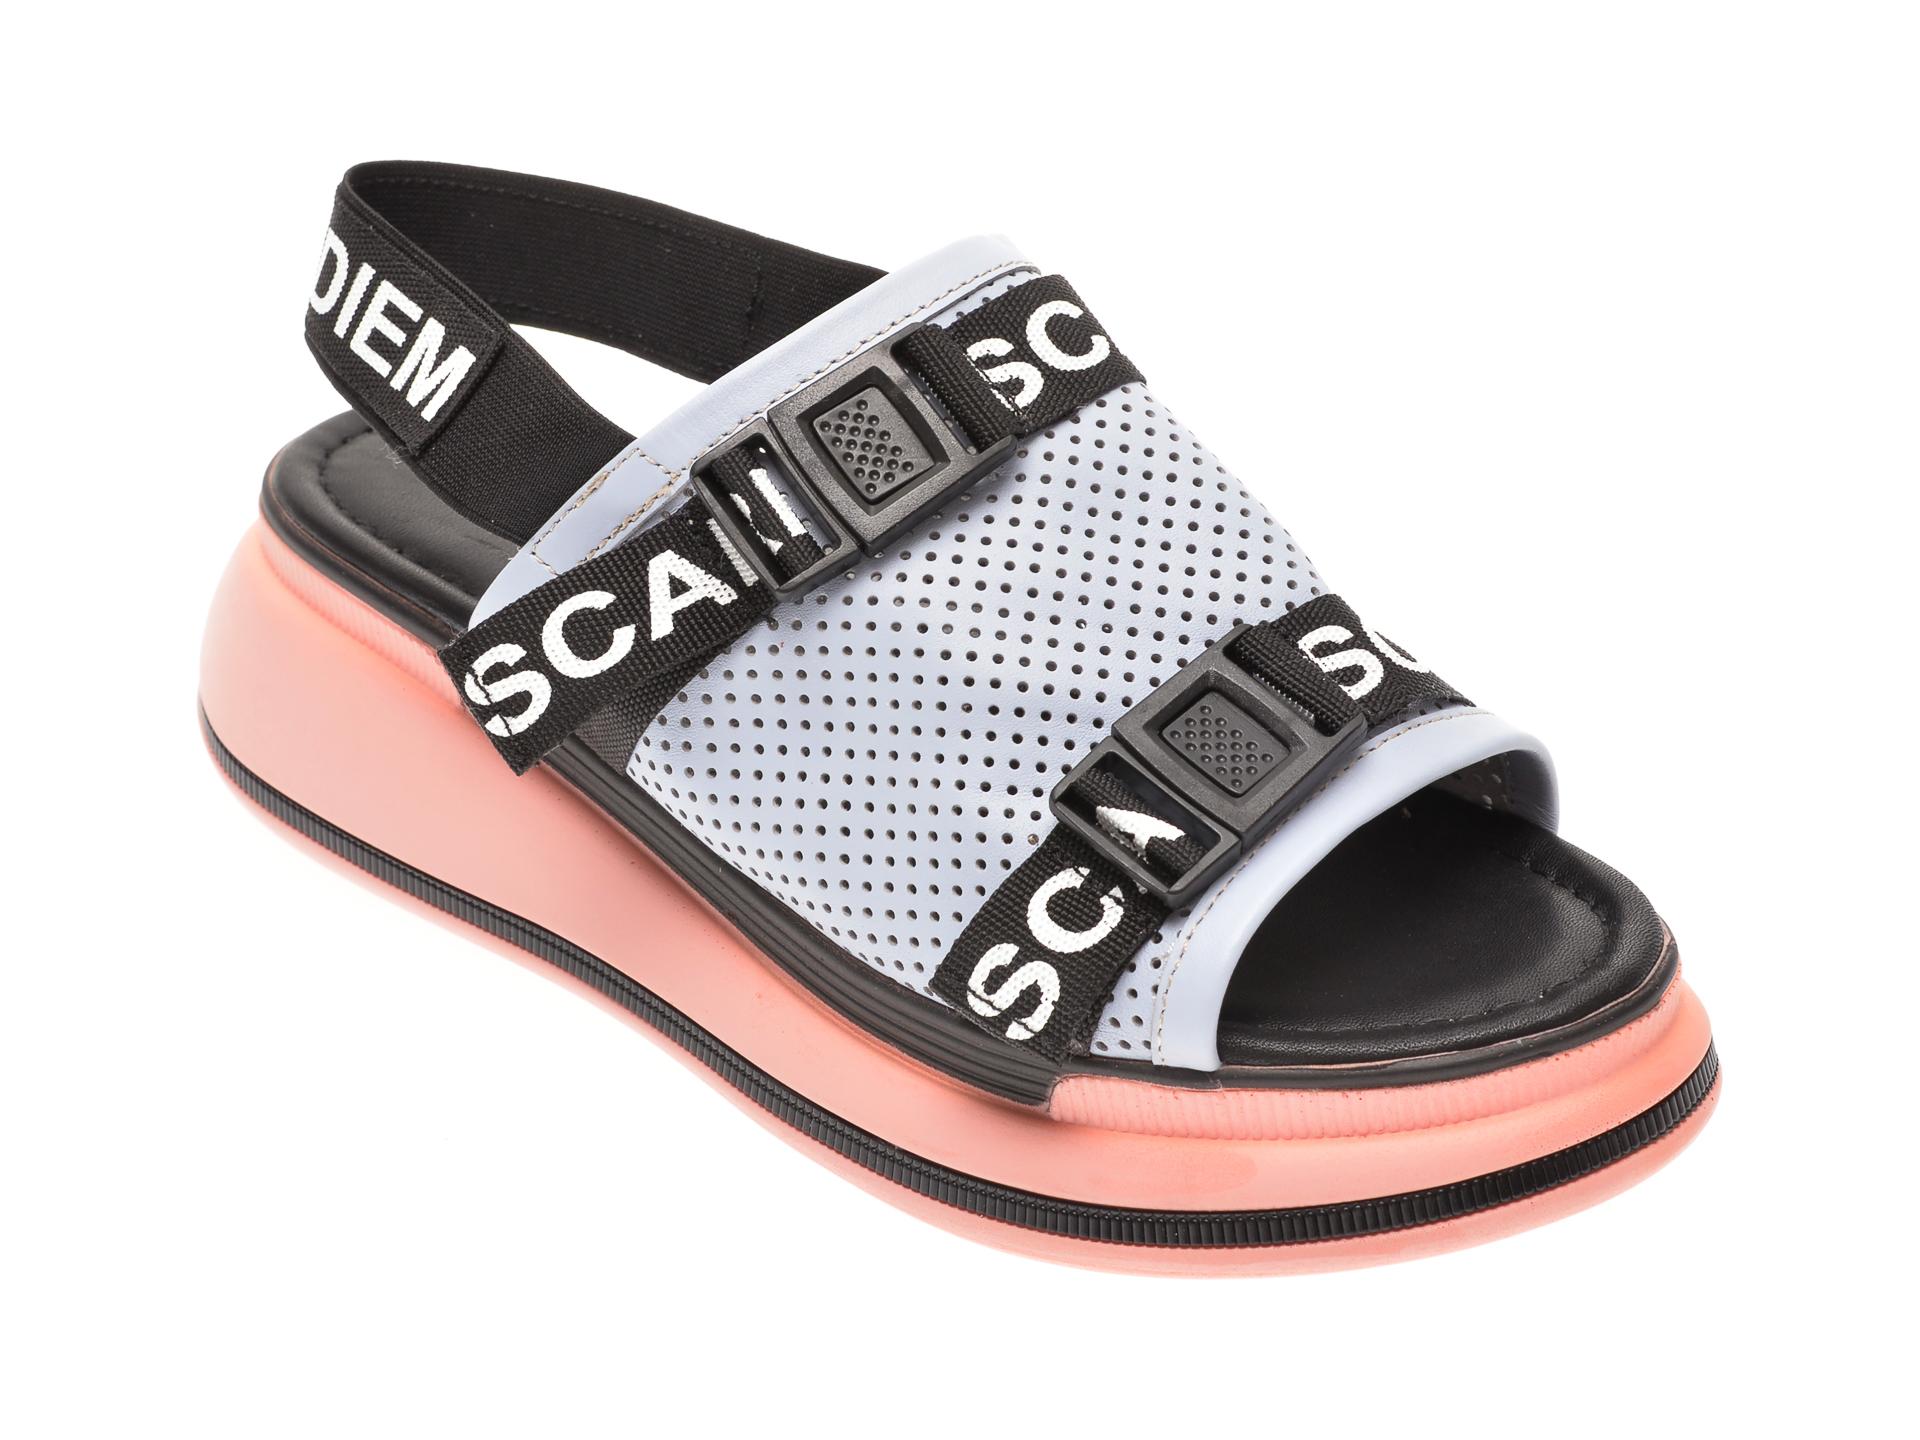 Sandale MISS LIZA albastre, 1182627, din piele naturala